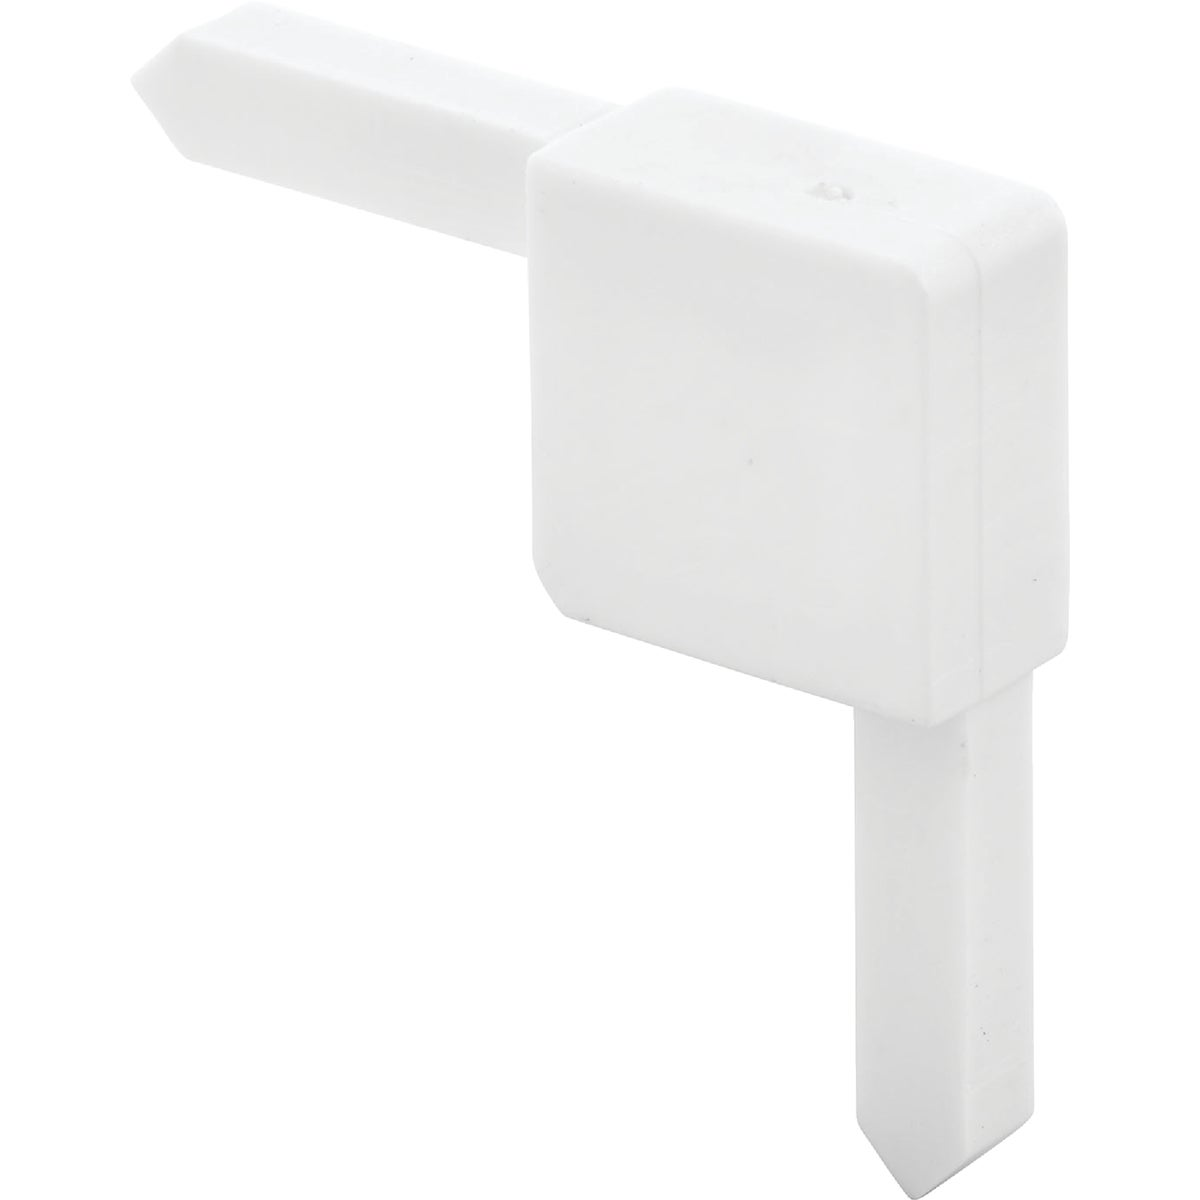 WHITE SQ CUT SASH CORNER - PL14323 by Prime Line Products